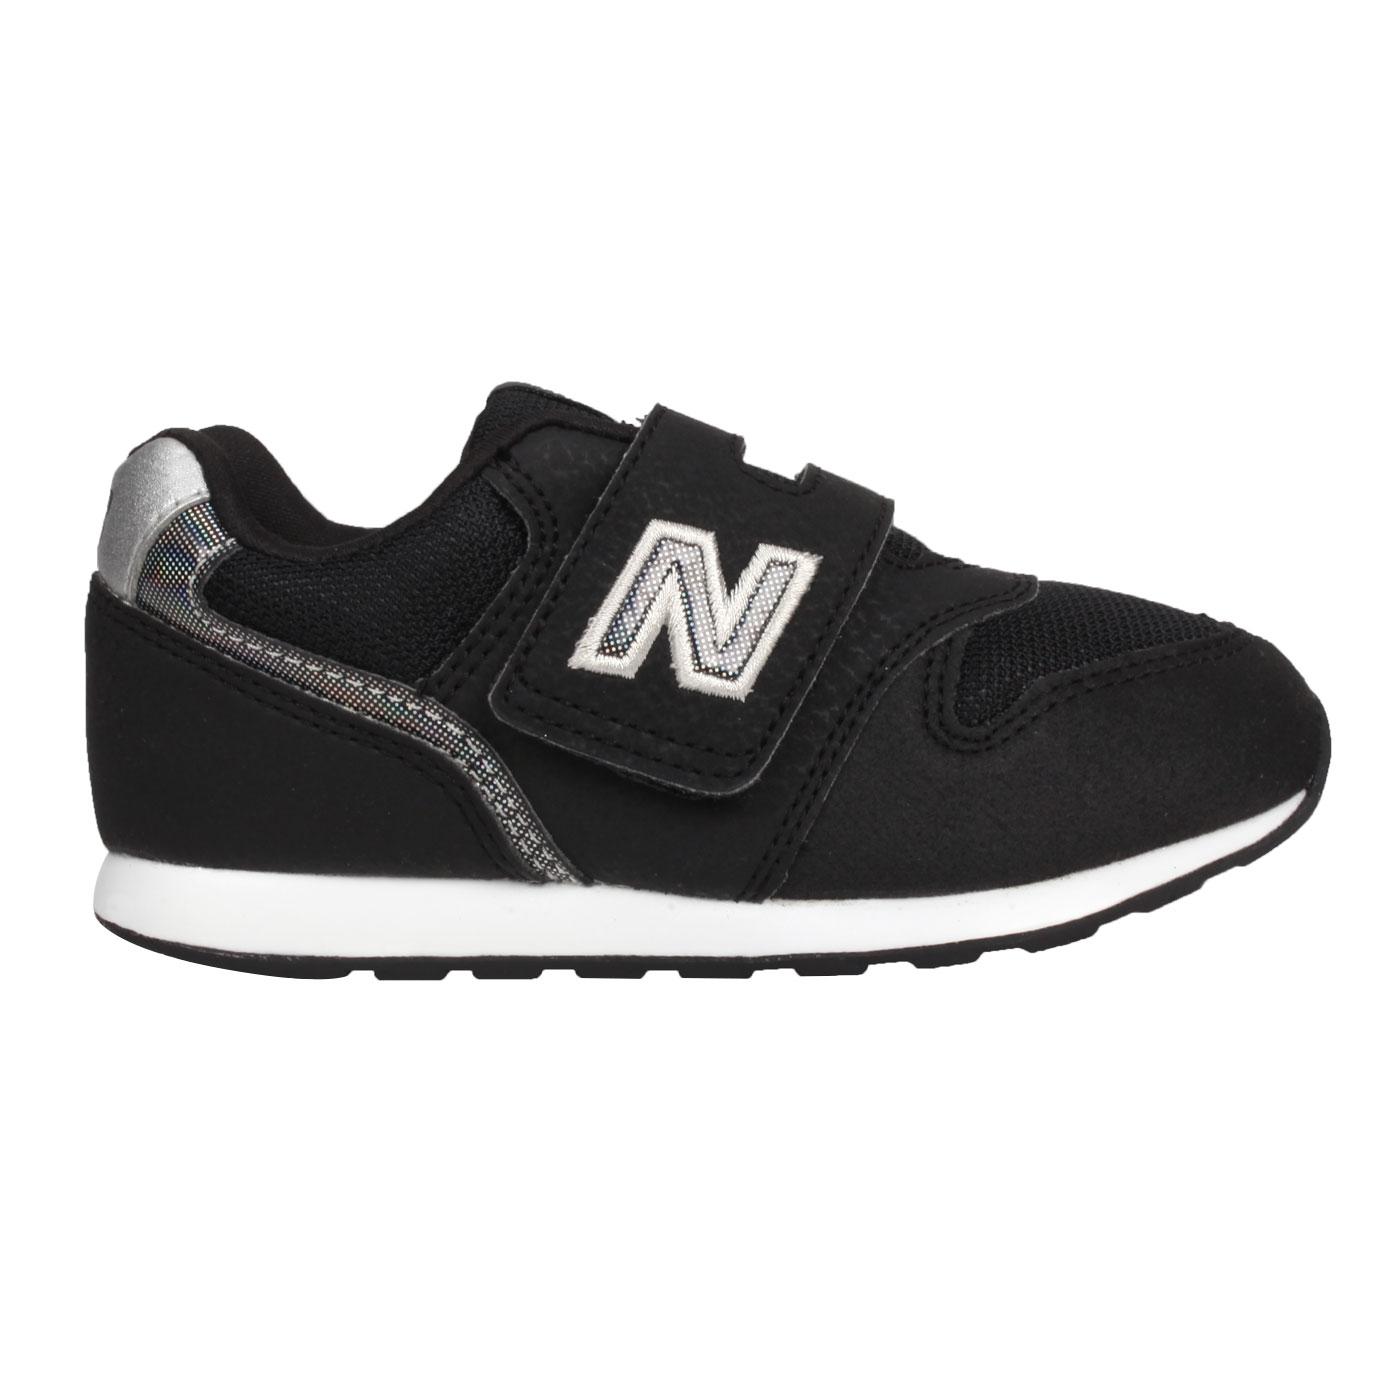 NEW BALANCE 小童運動休閒鞋-WIDE IZ996HBK - 黑銀